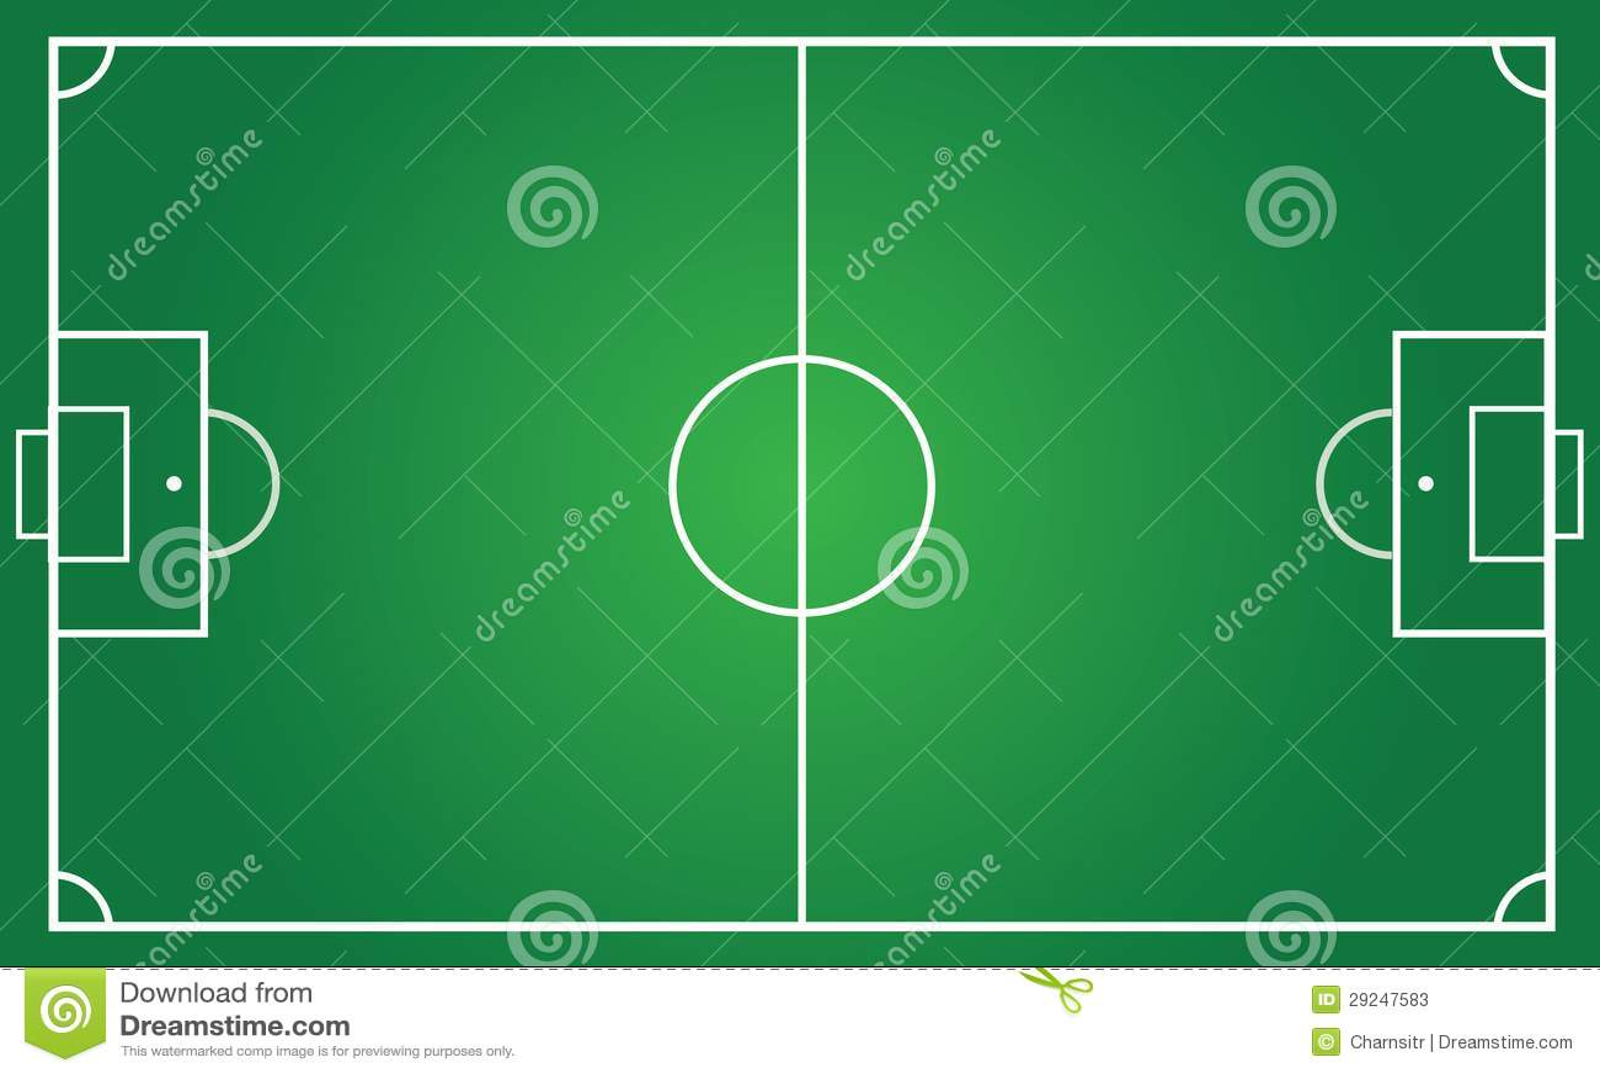 Football pitch metric